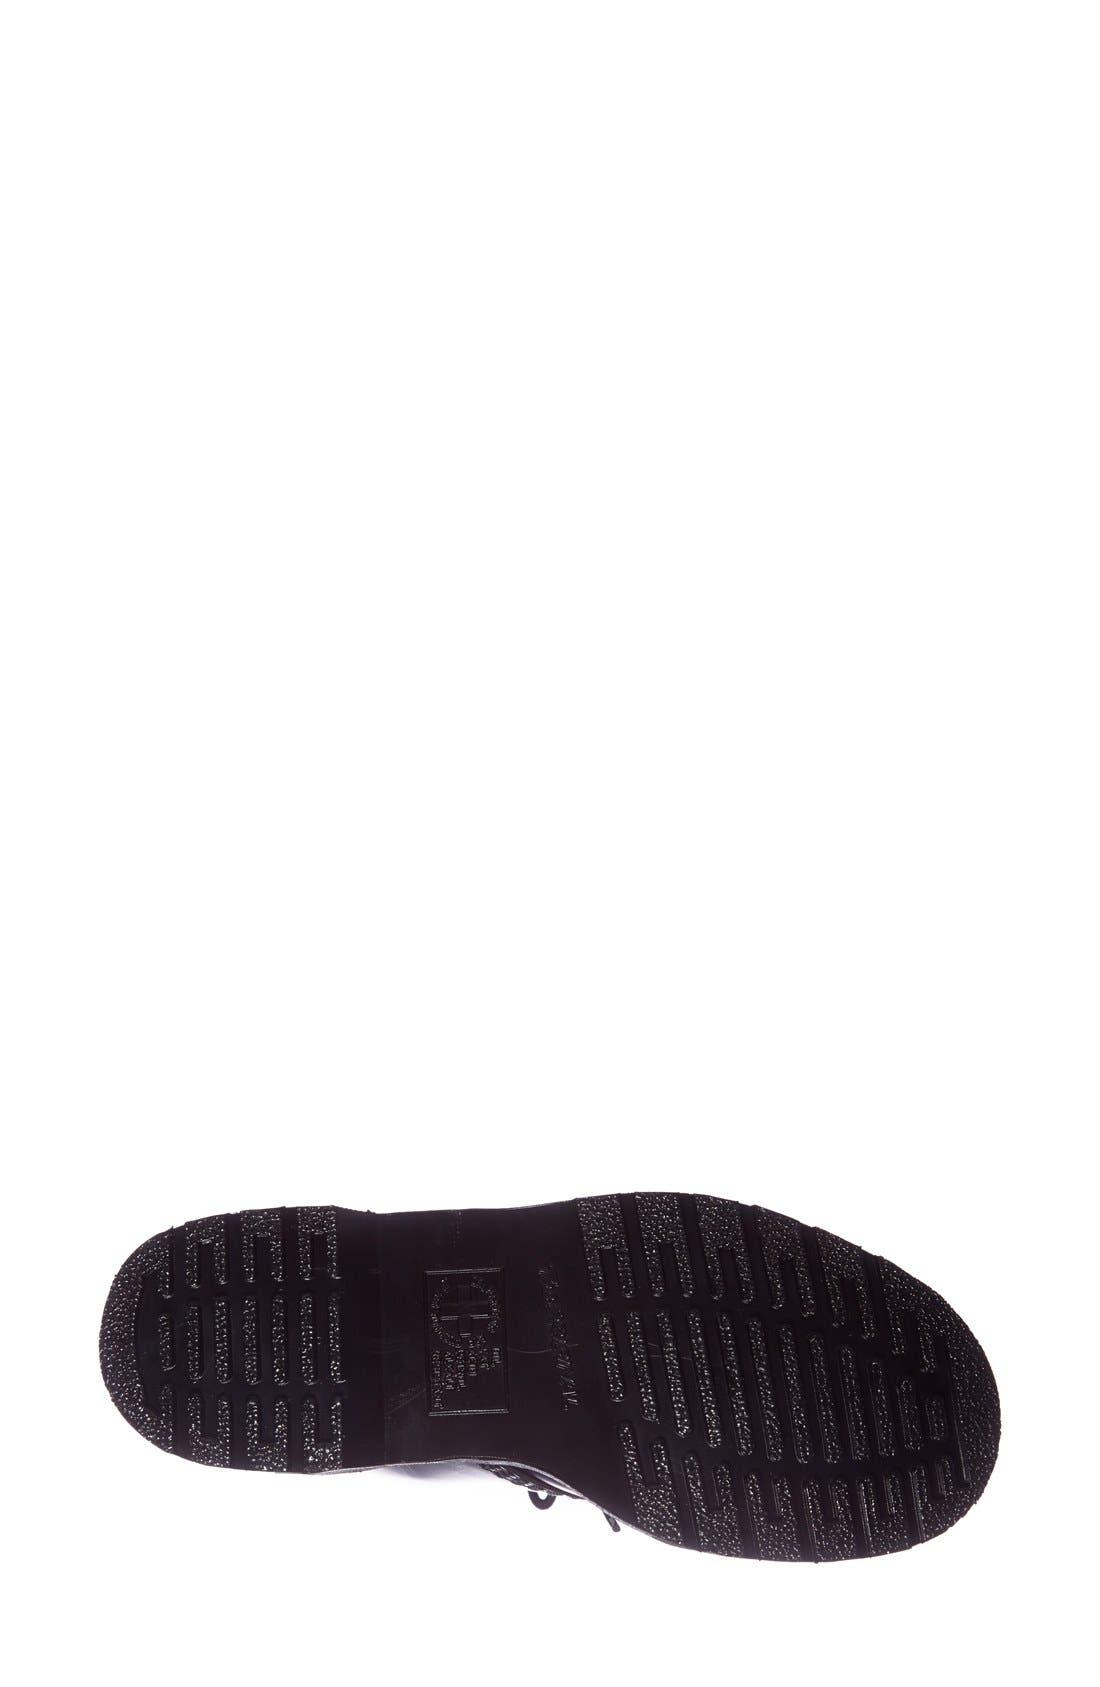 '1460 Mono' Boot,                             Alternate thumbnail 2, color,                             001